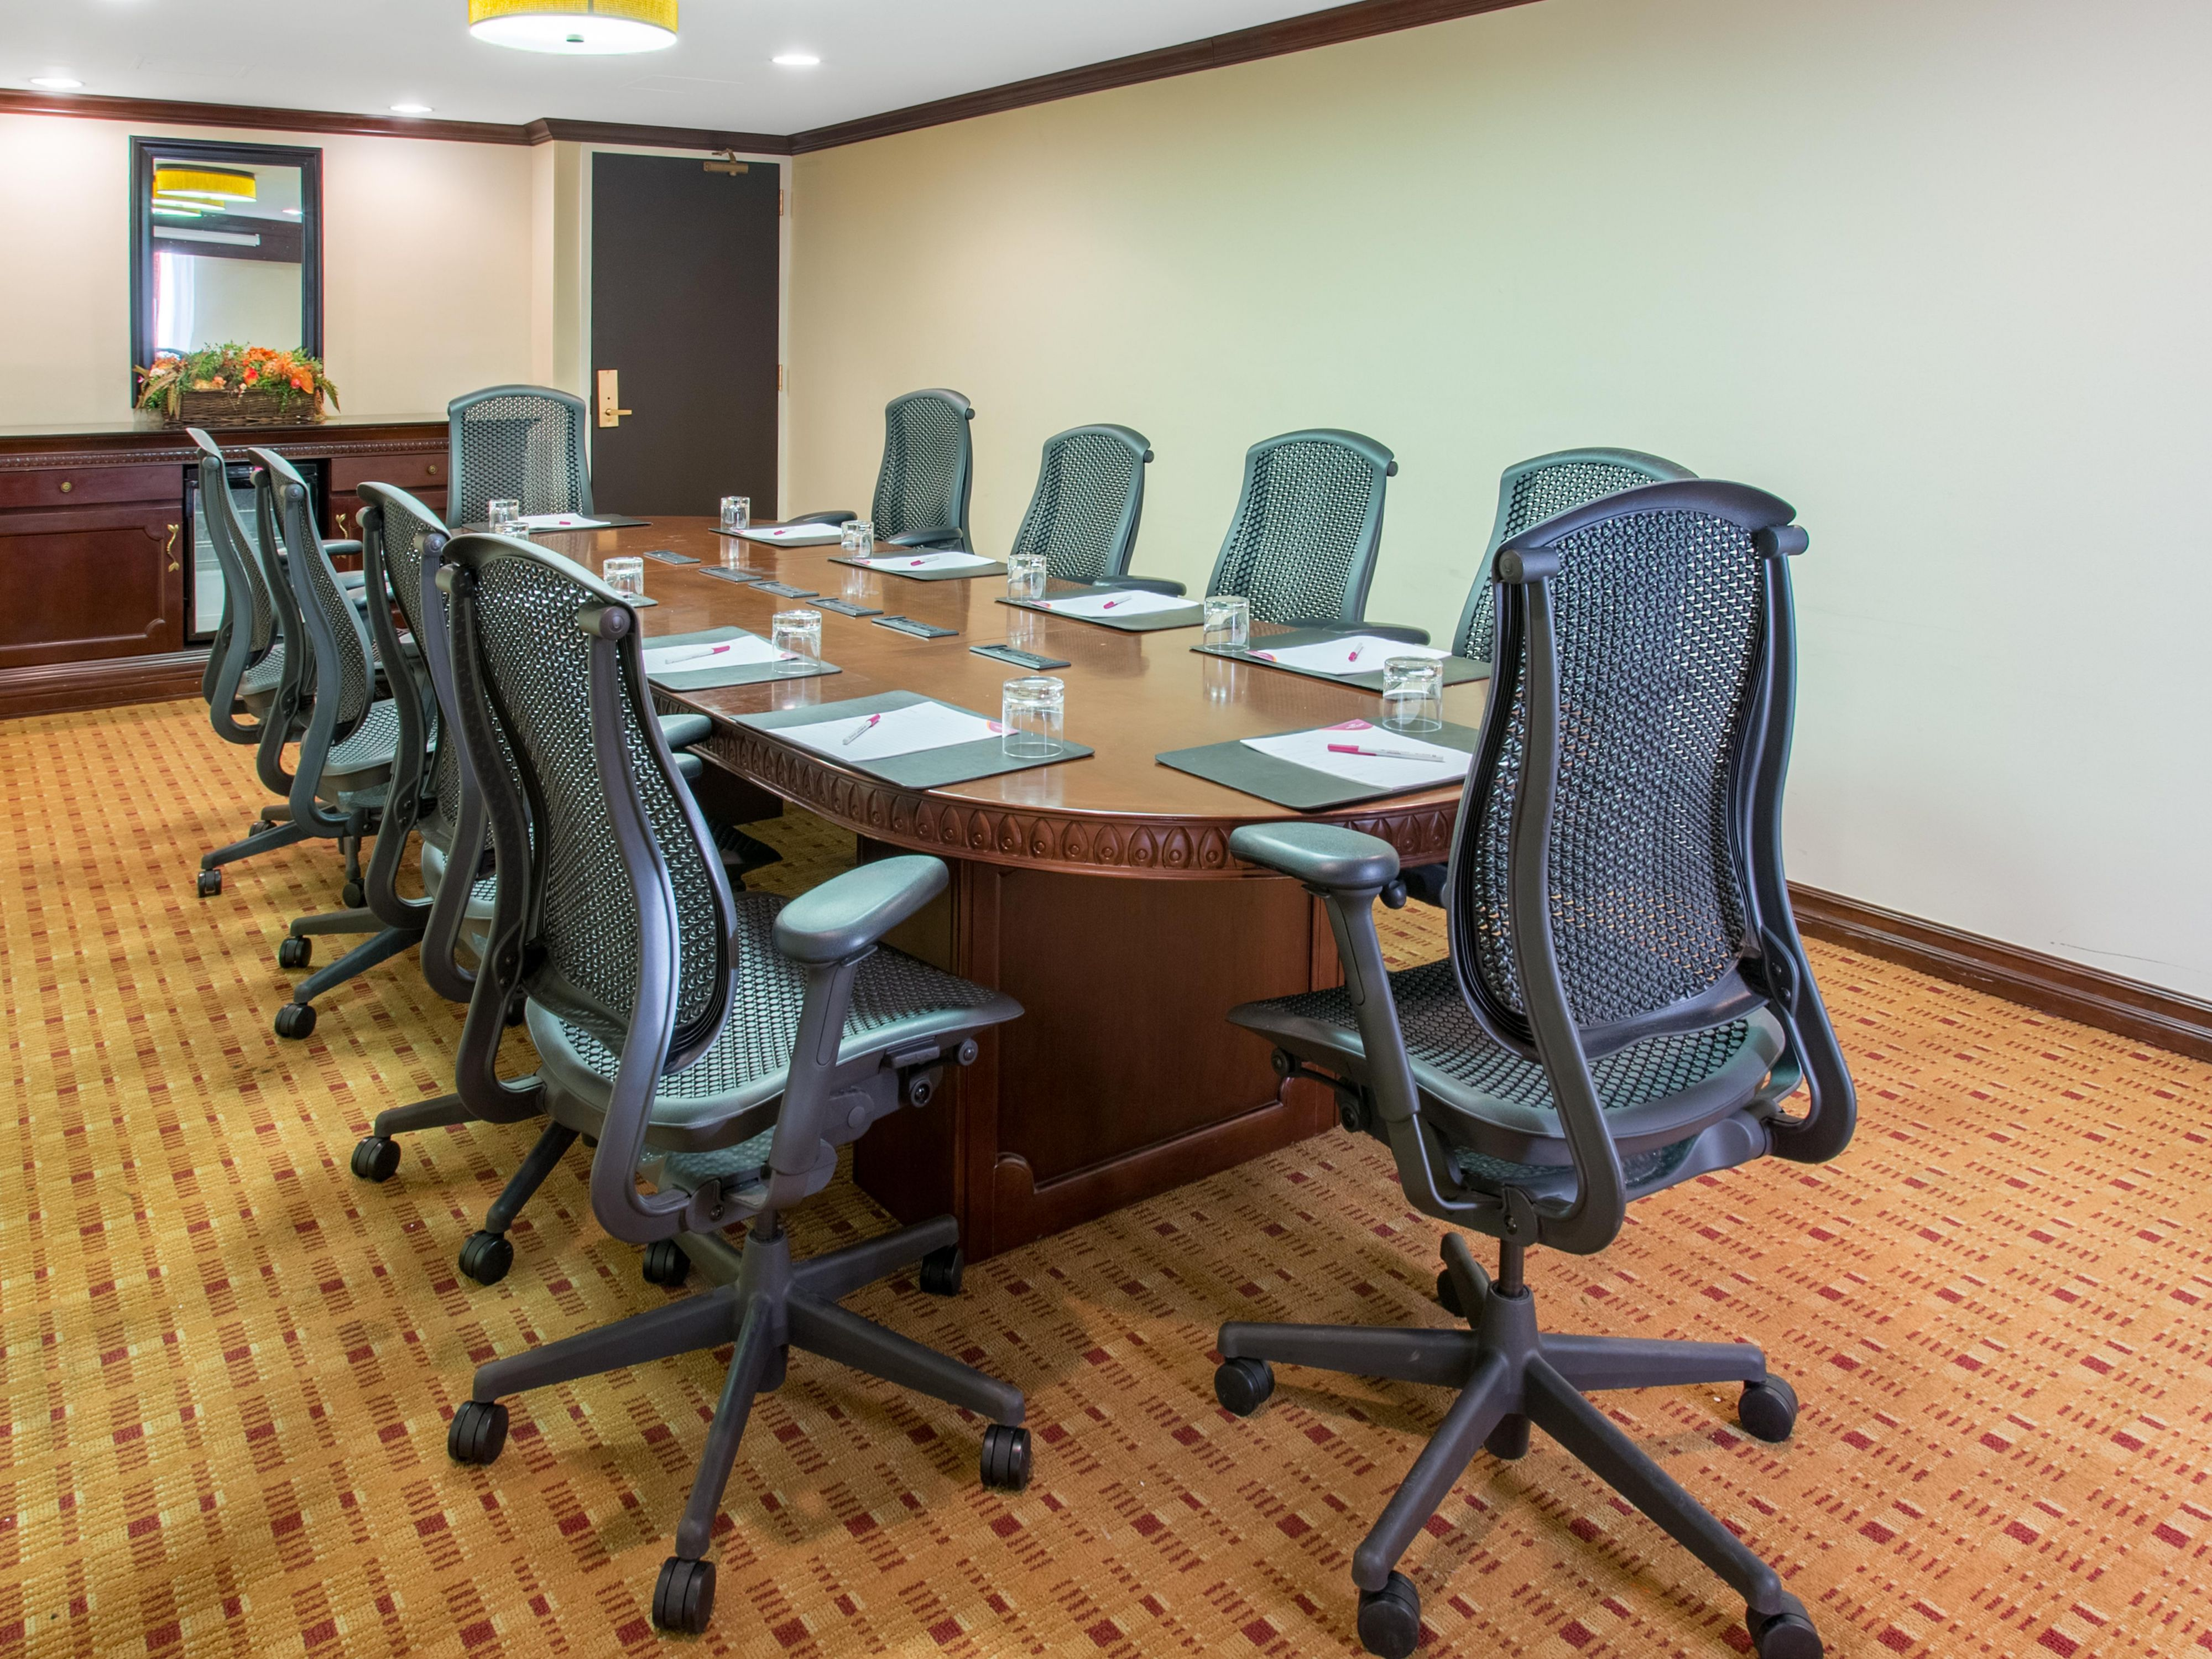 Crowne Plaza Albuquerque Hotel Meeting Rooms for Rent